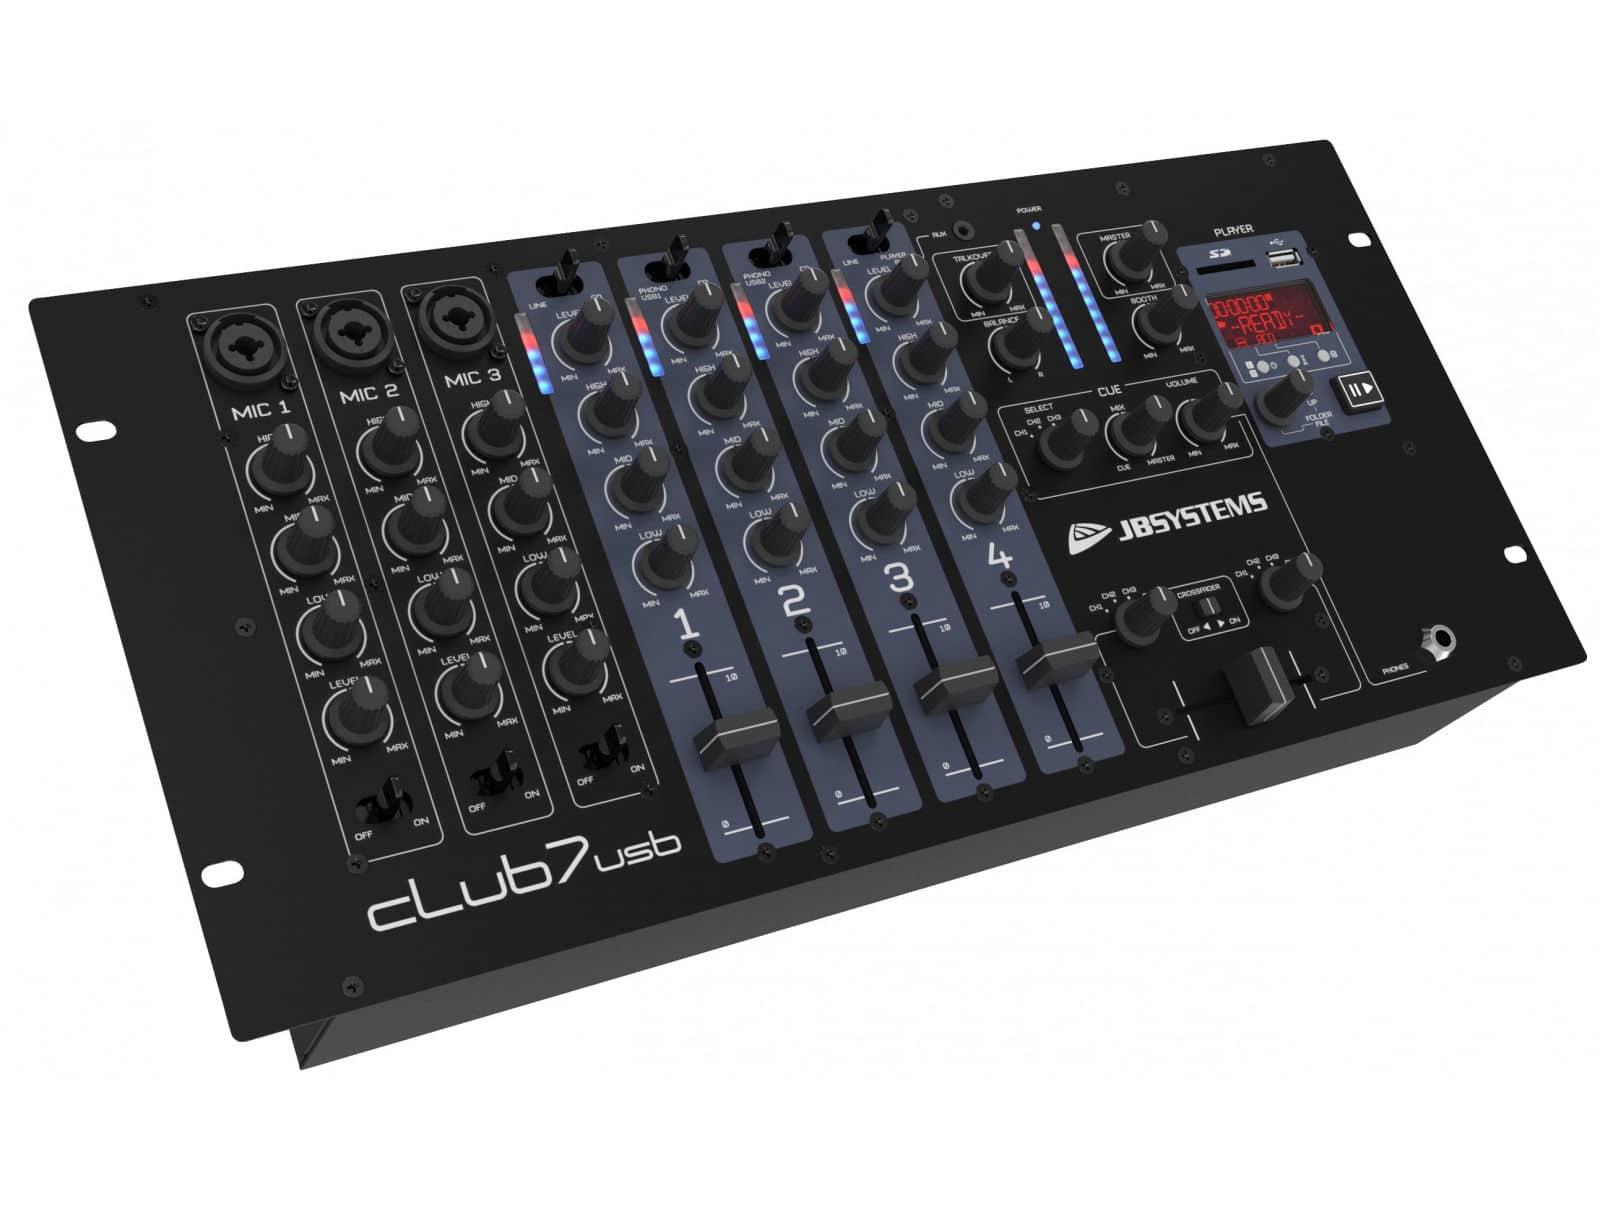 Djmixer - JB Systems Club7 USB - Onlineshop Musikhaus Kirstein